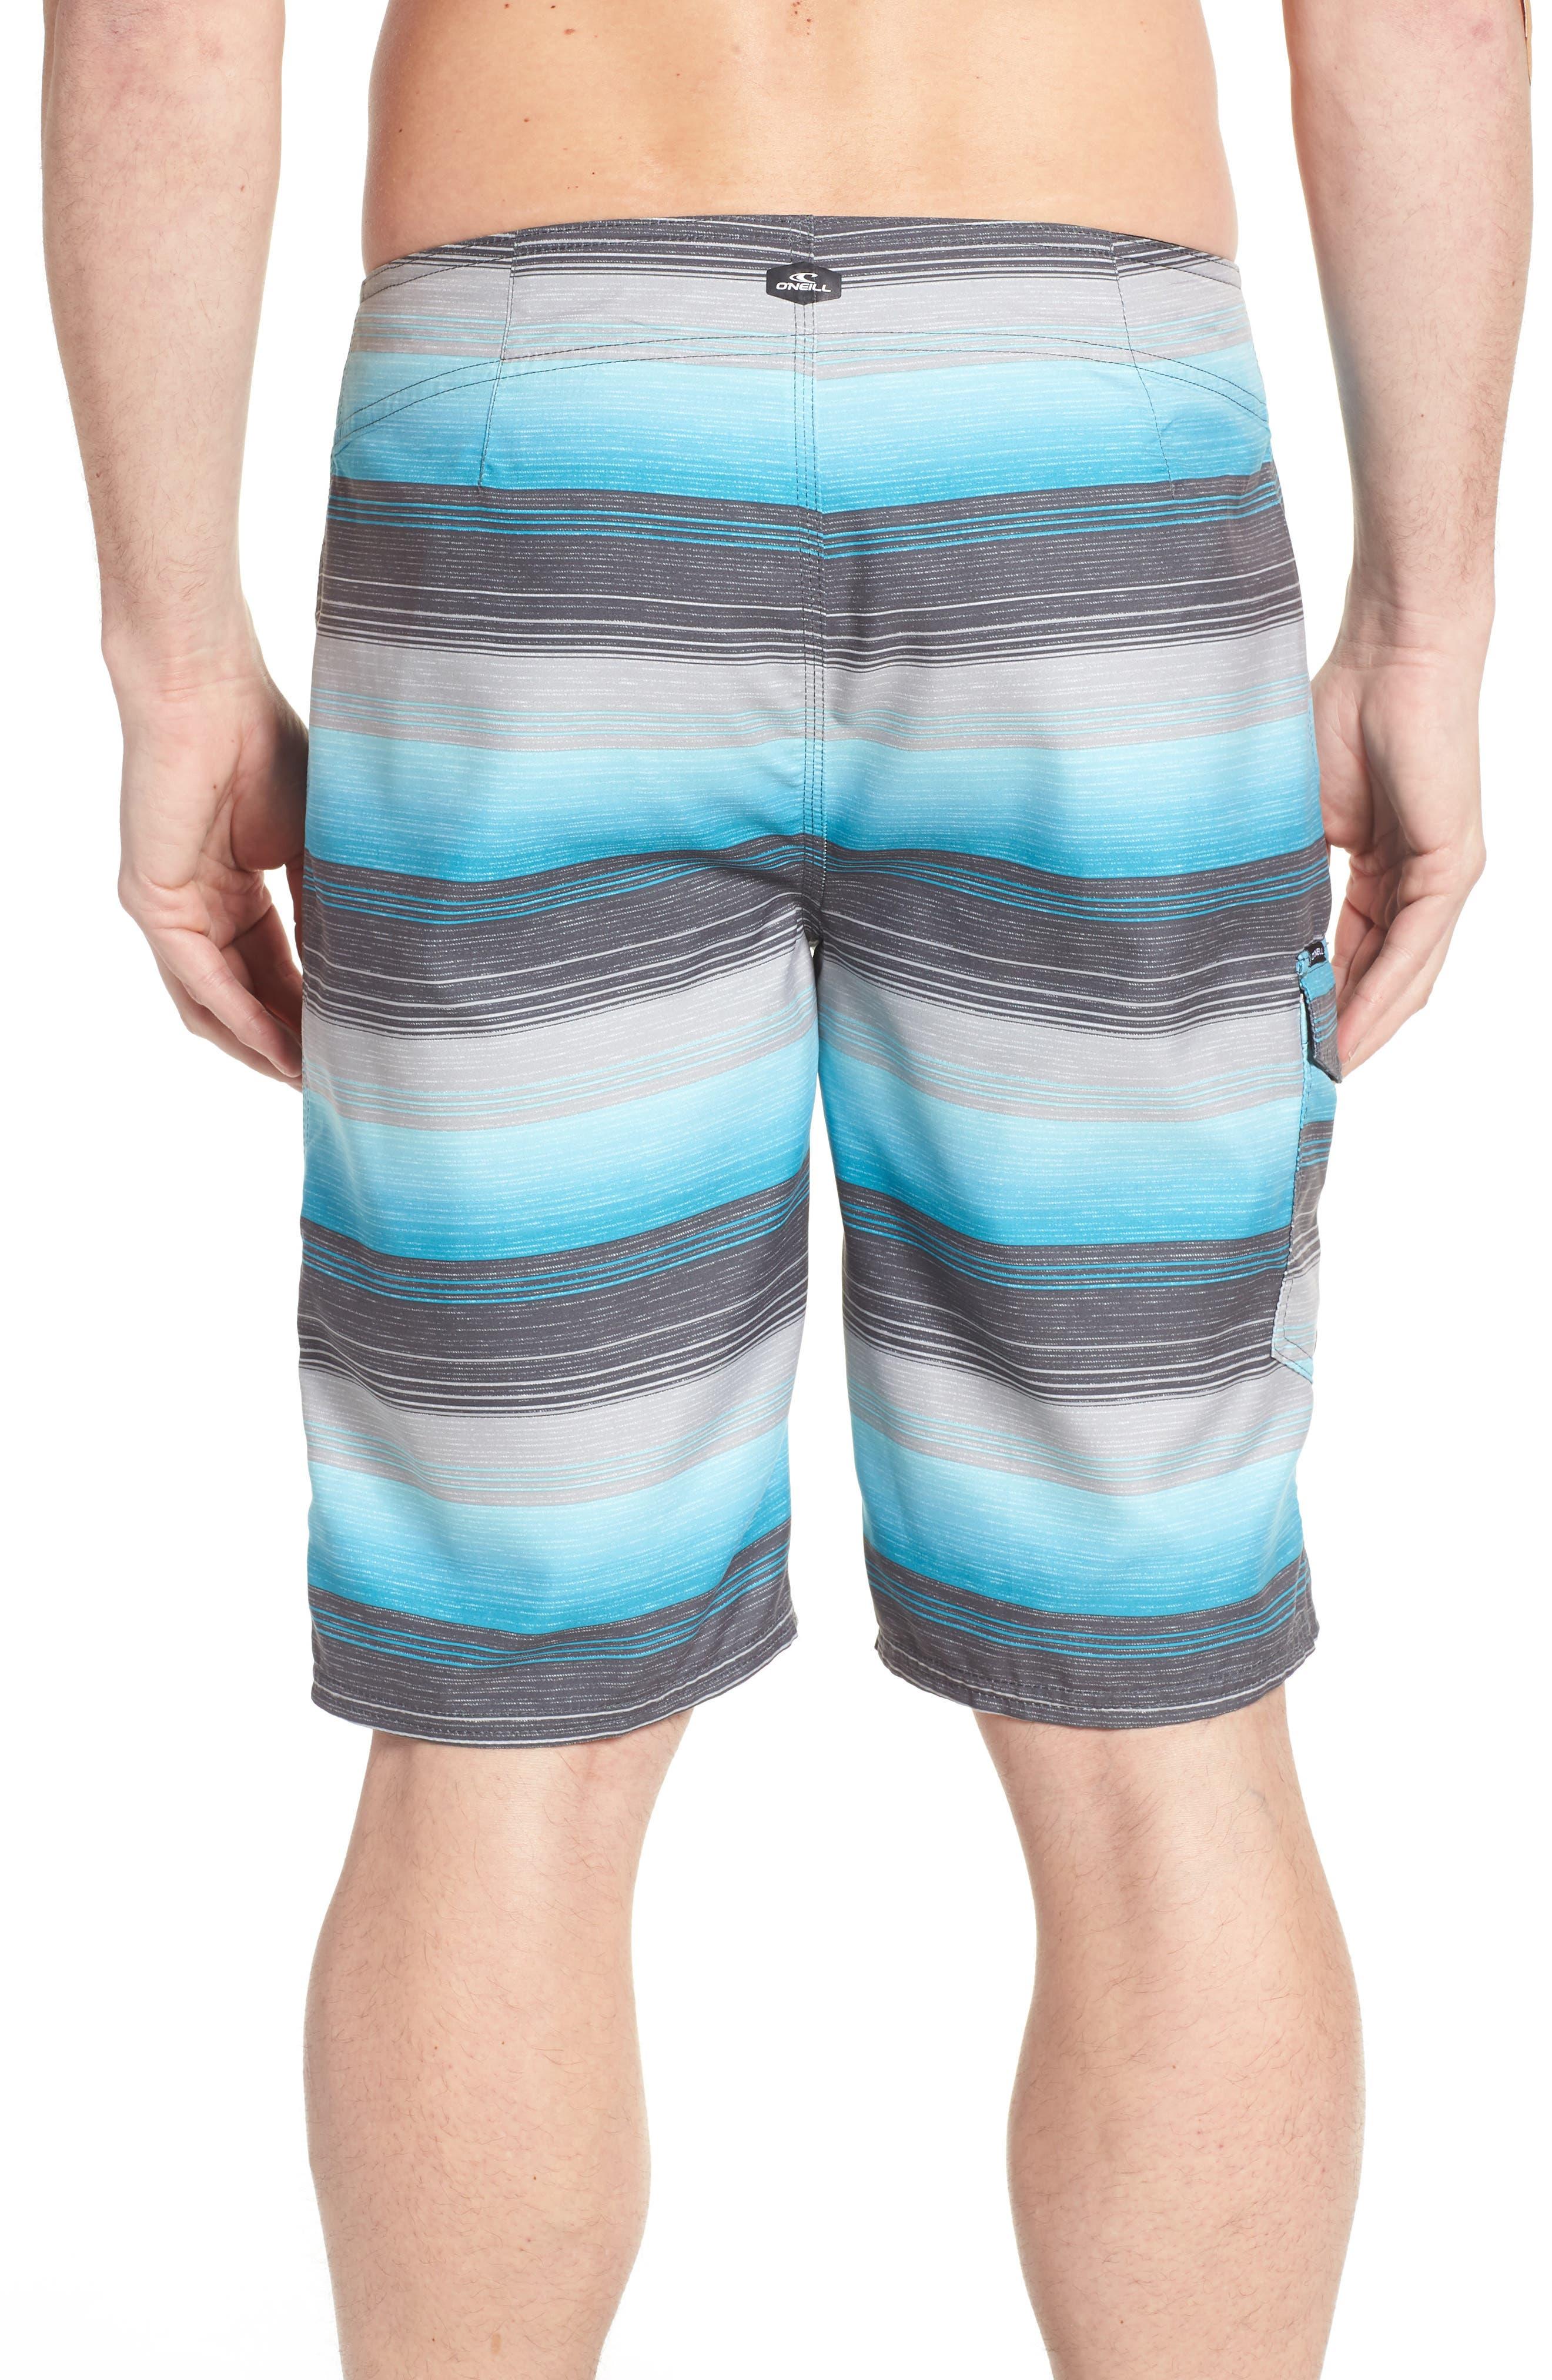 Santa Cruz Board Shorts,                             Alternate thumbnail 2, color,                             Ocean